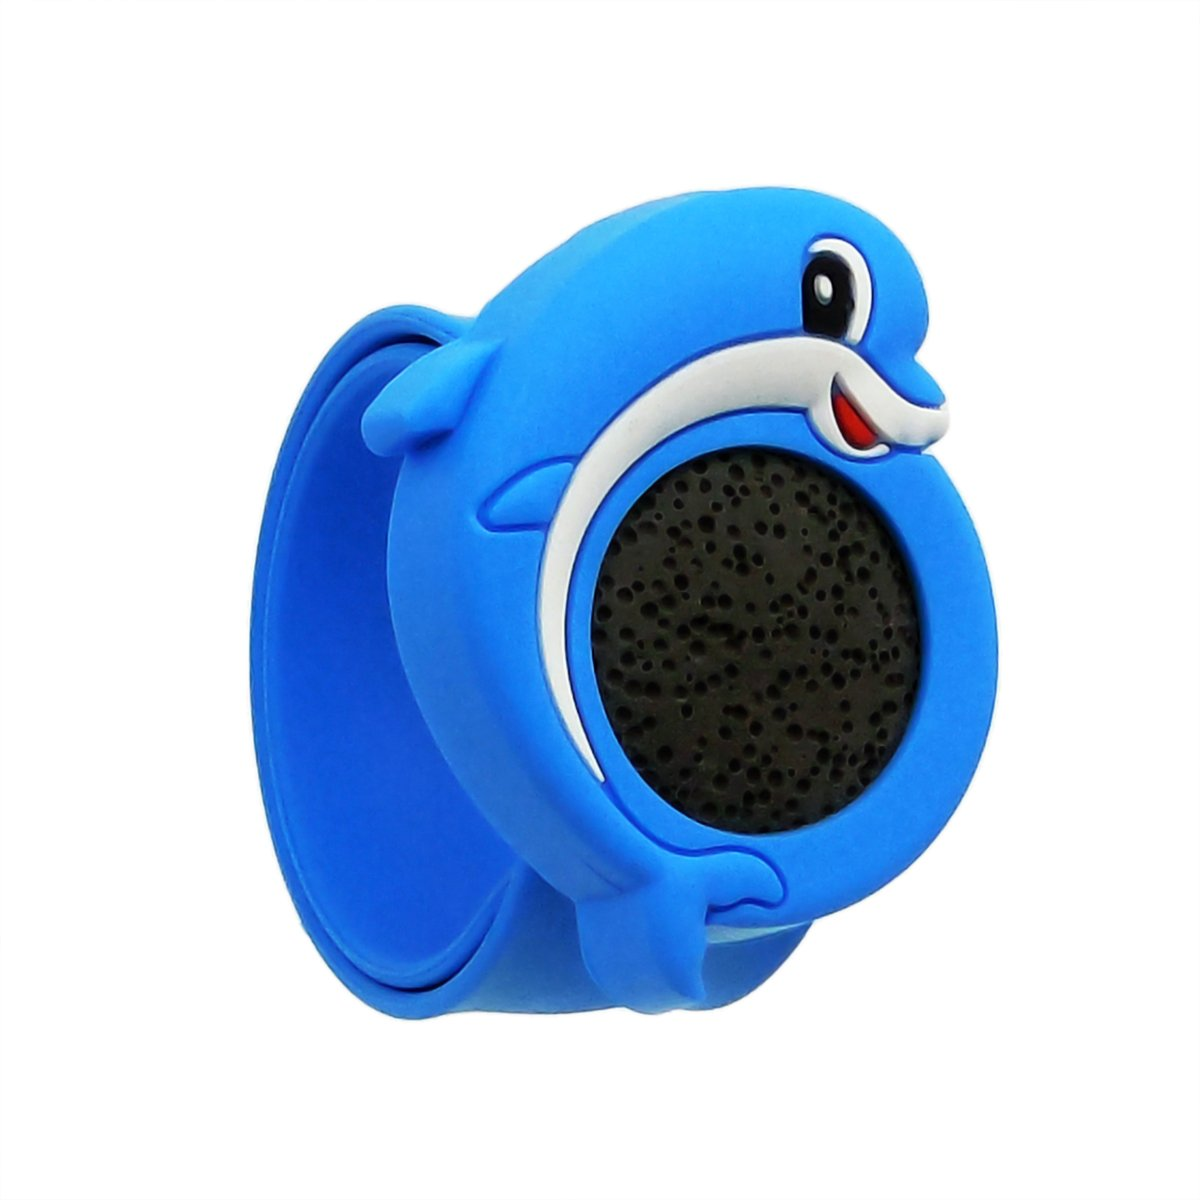 NewStar Kid Essential Oil Bracelets Lava Stone Diffuser Slap Bracelet Children Blue Cartoon Dolphin Wristband by NewStar